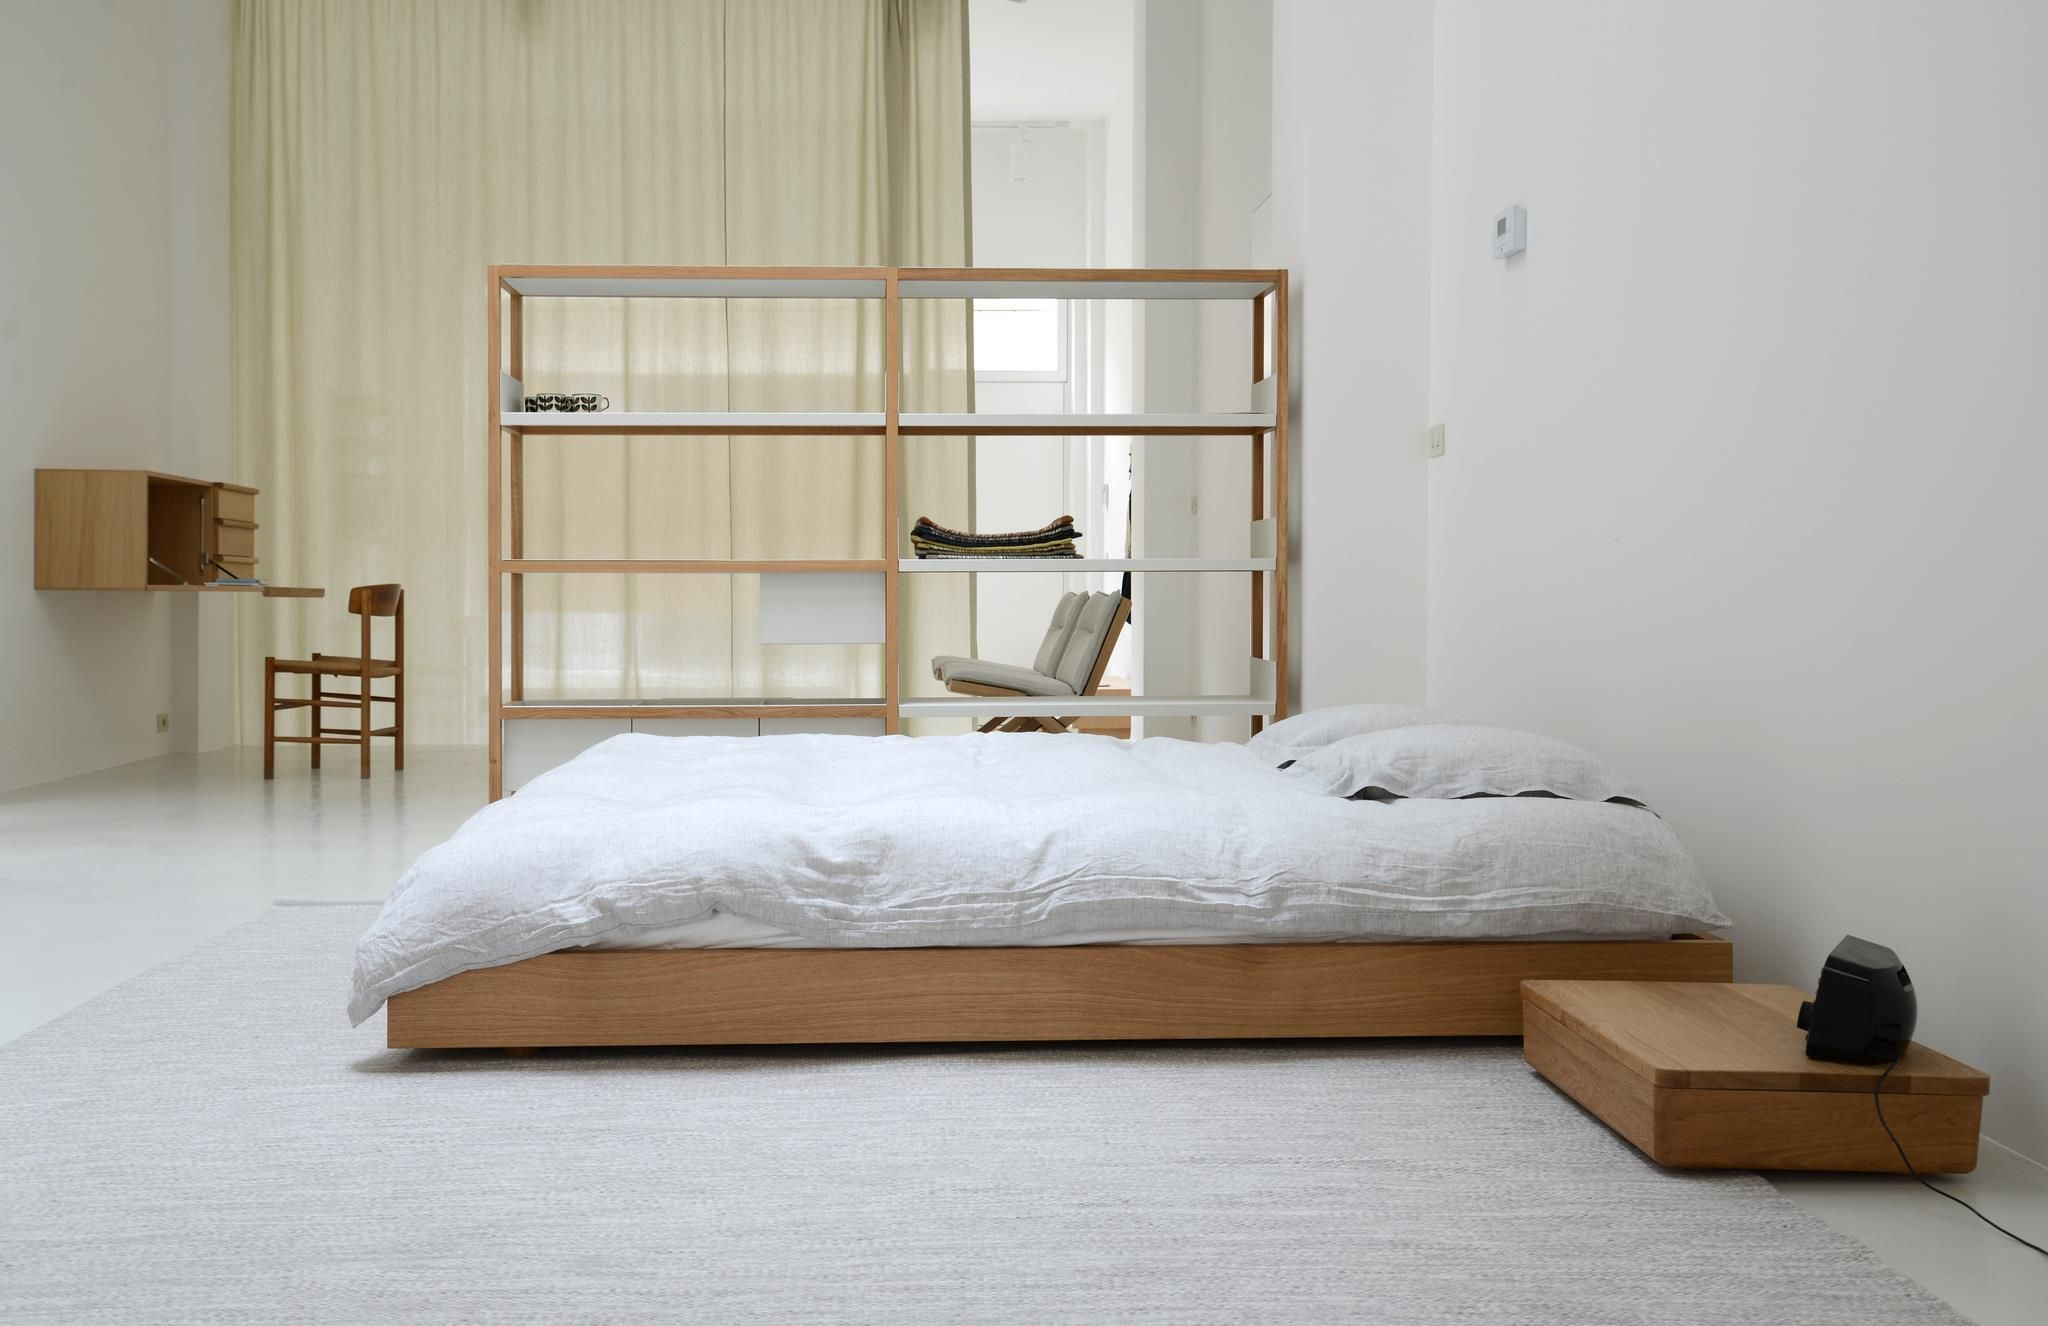 Leibal Lowtable Ma 6 Oak Bed Frame Bedroom Inspirations Oak Bedroom Furniture Latest minimalist wooden bedroom